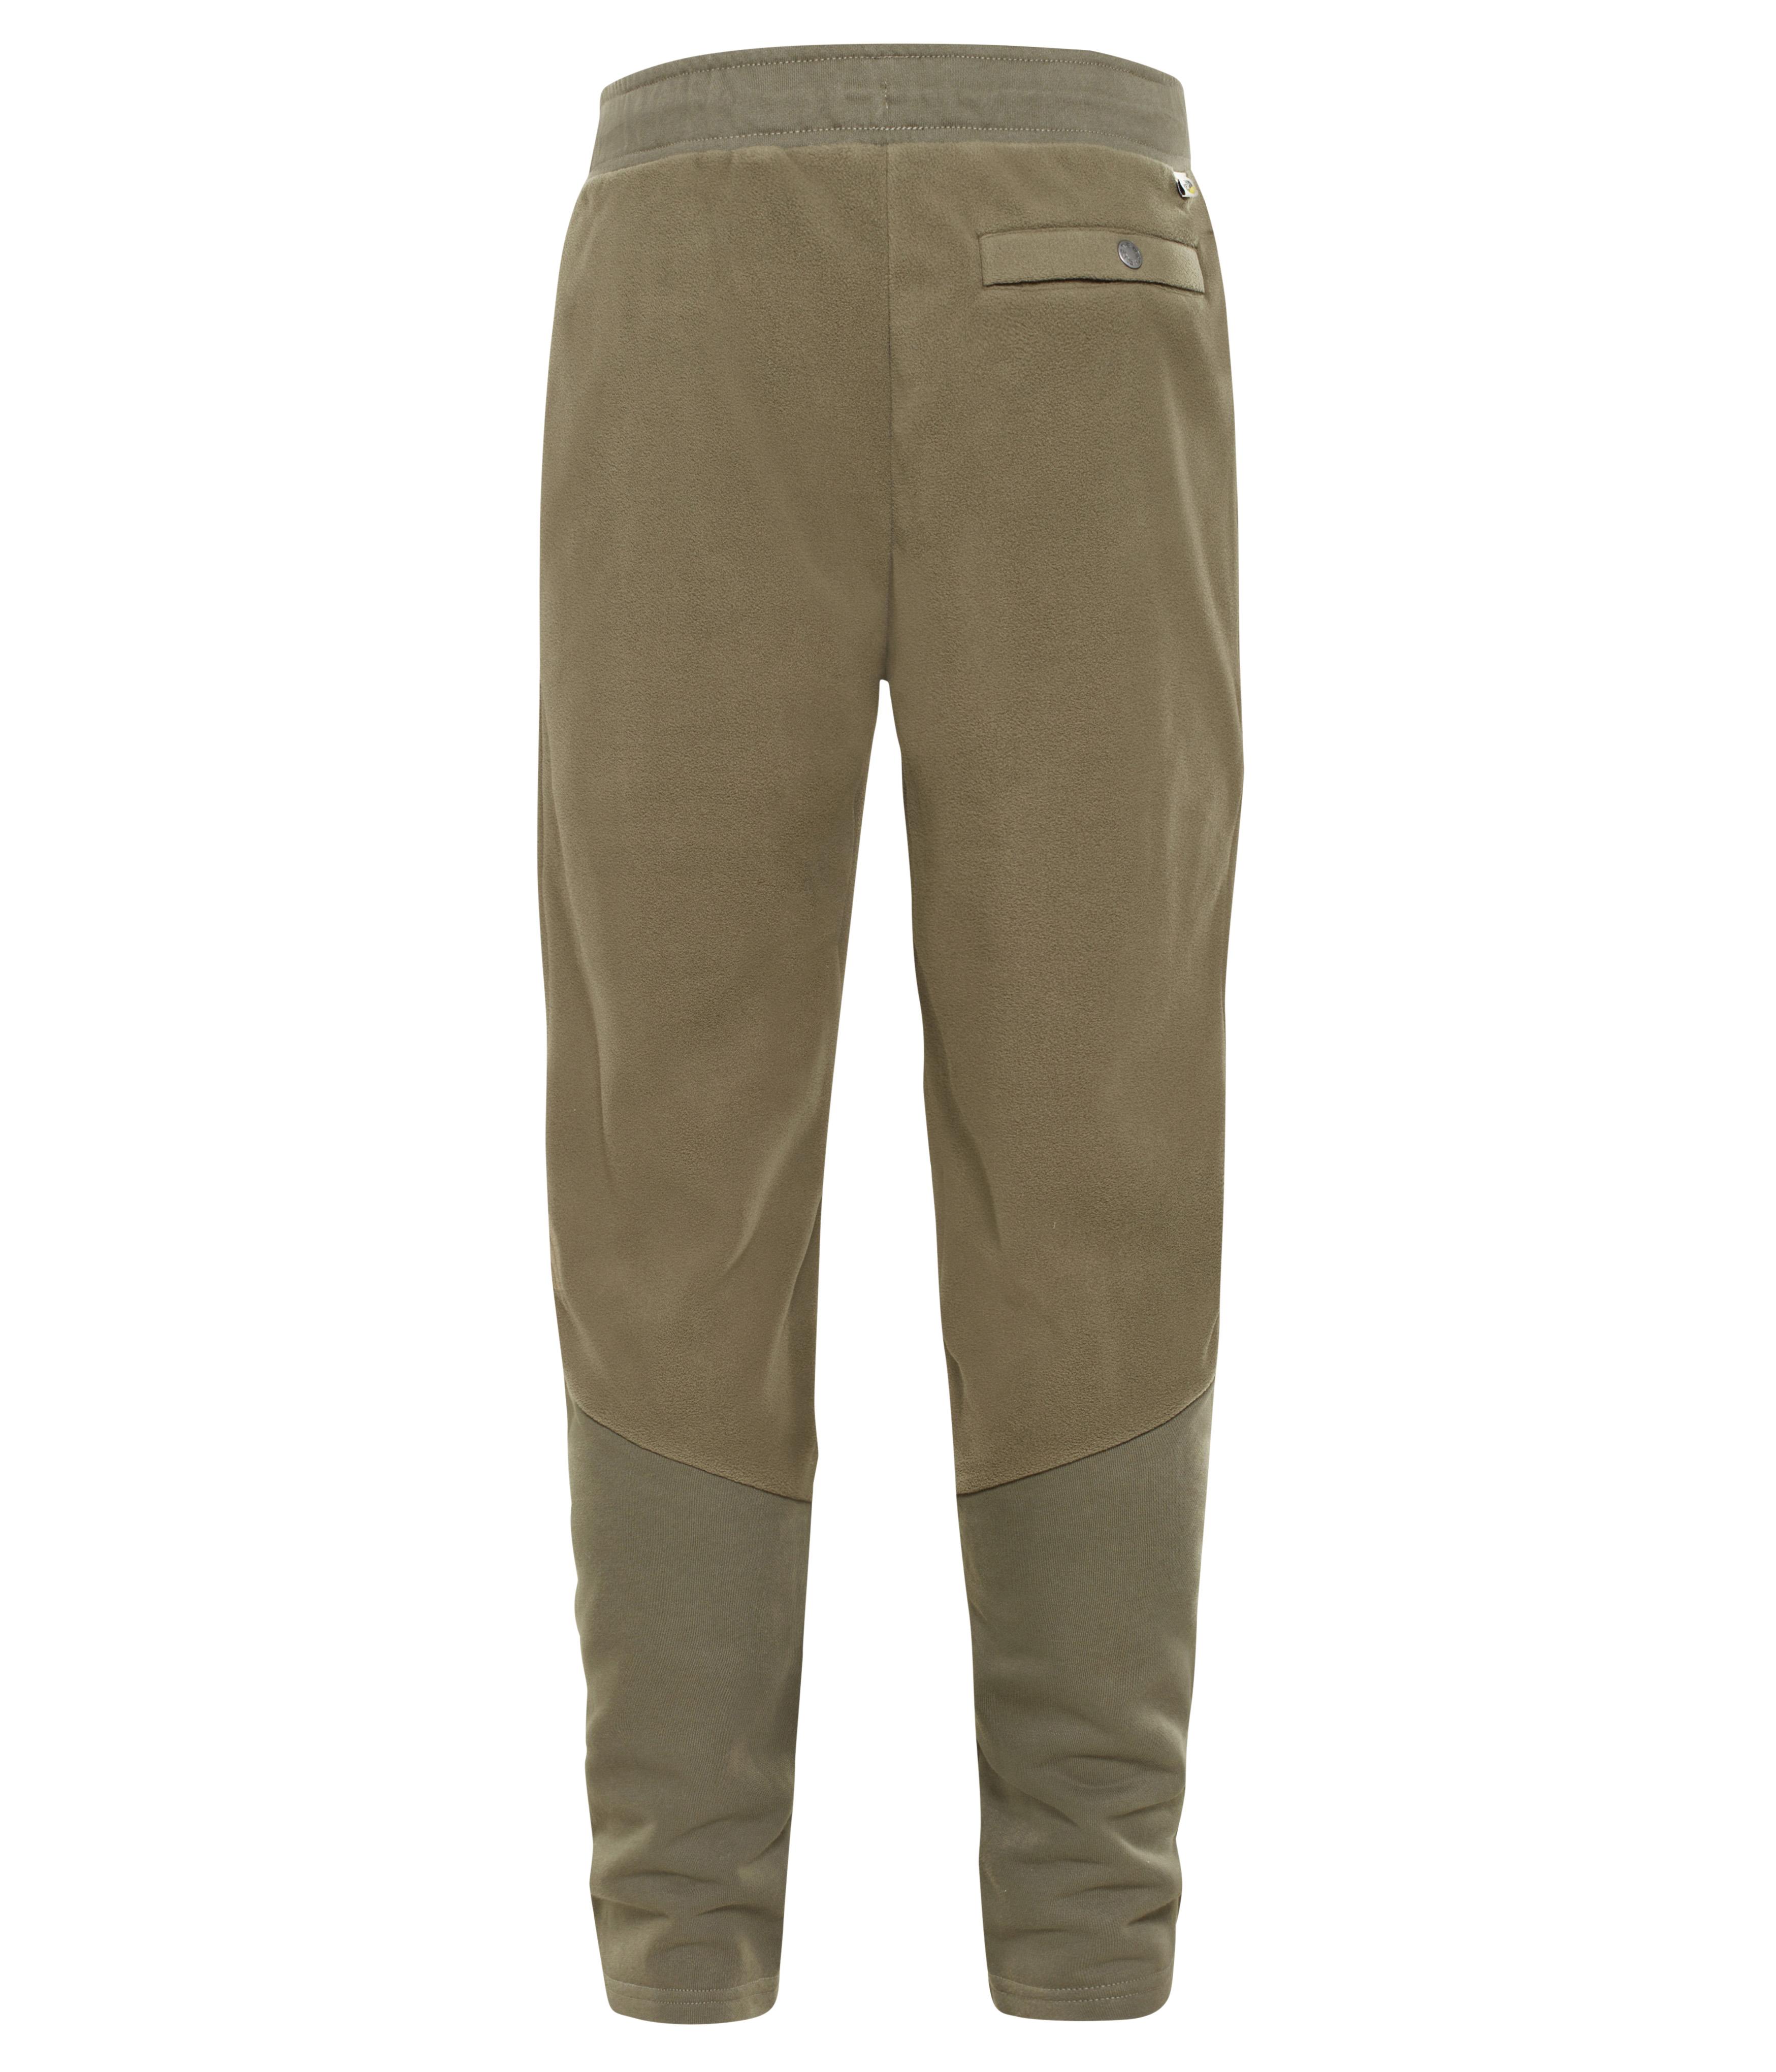 The North Face - Tekware Pantaloni Pantaloni Pantaloni Delta Pants grigio  Polartec Recycled Uomo 9629fa